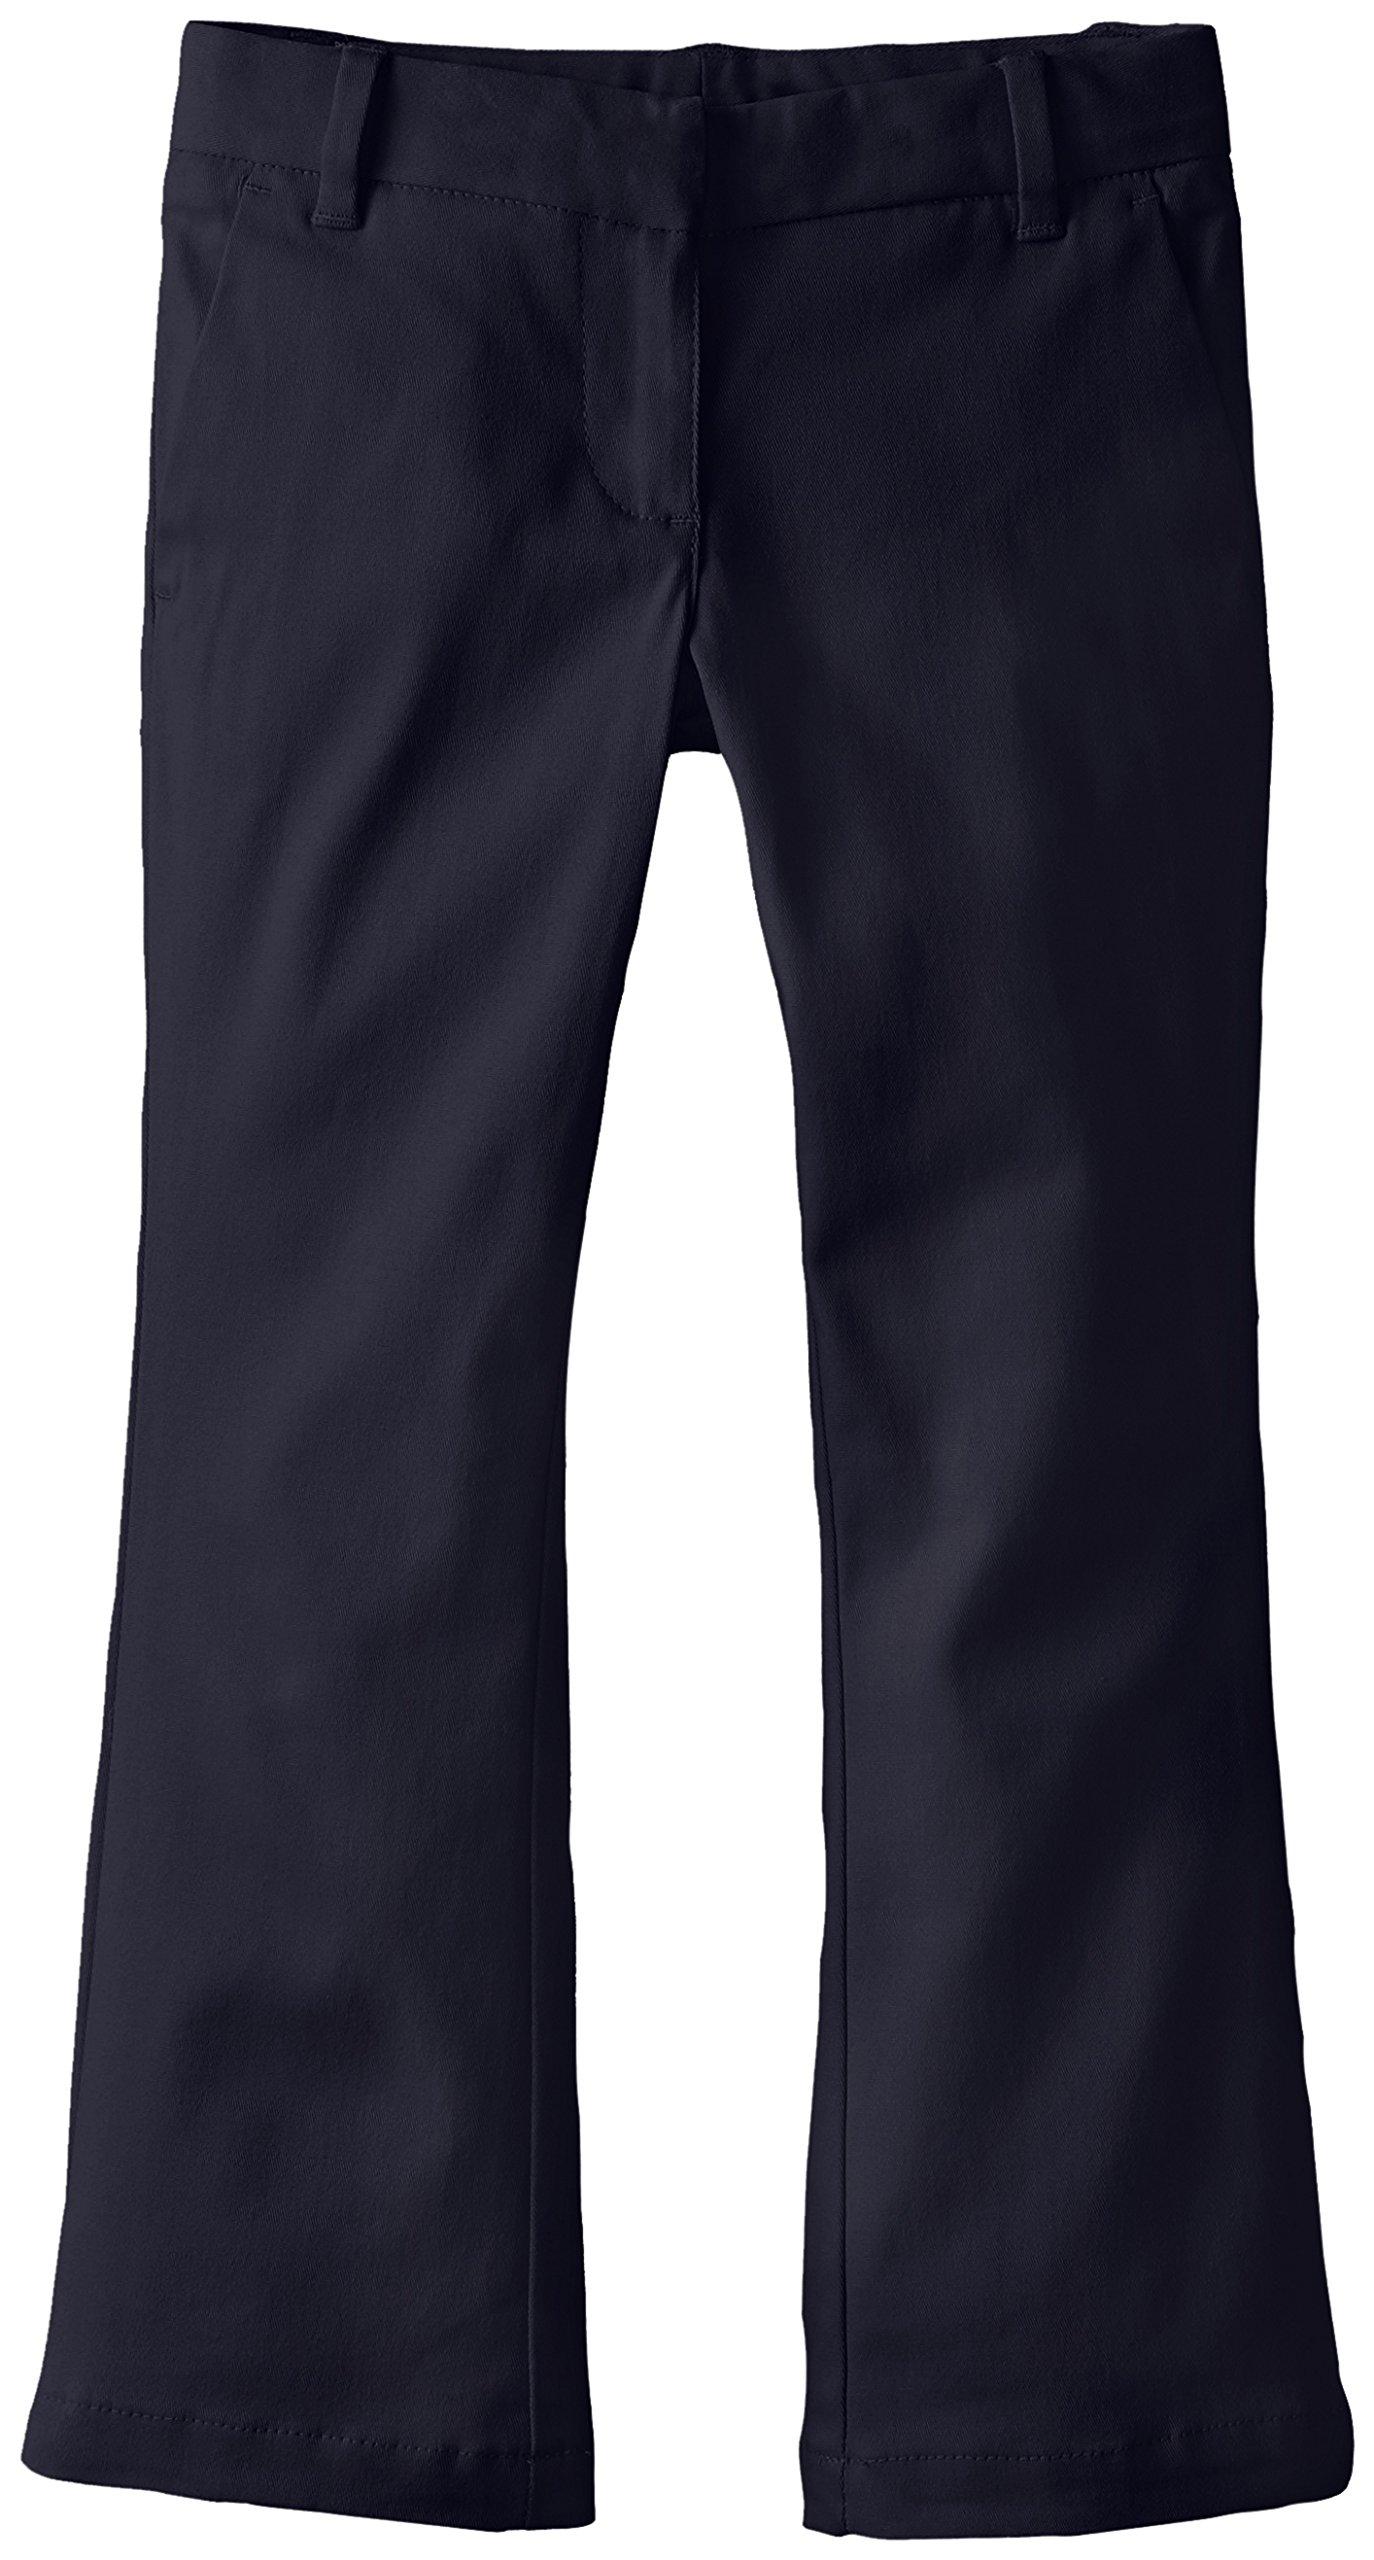 IZOD Little Girls' Uniform Pant Skinny Boot, Navy, 4 Slim